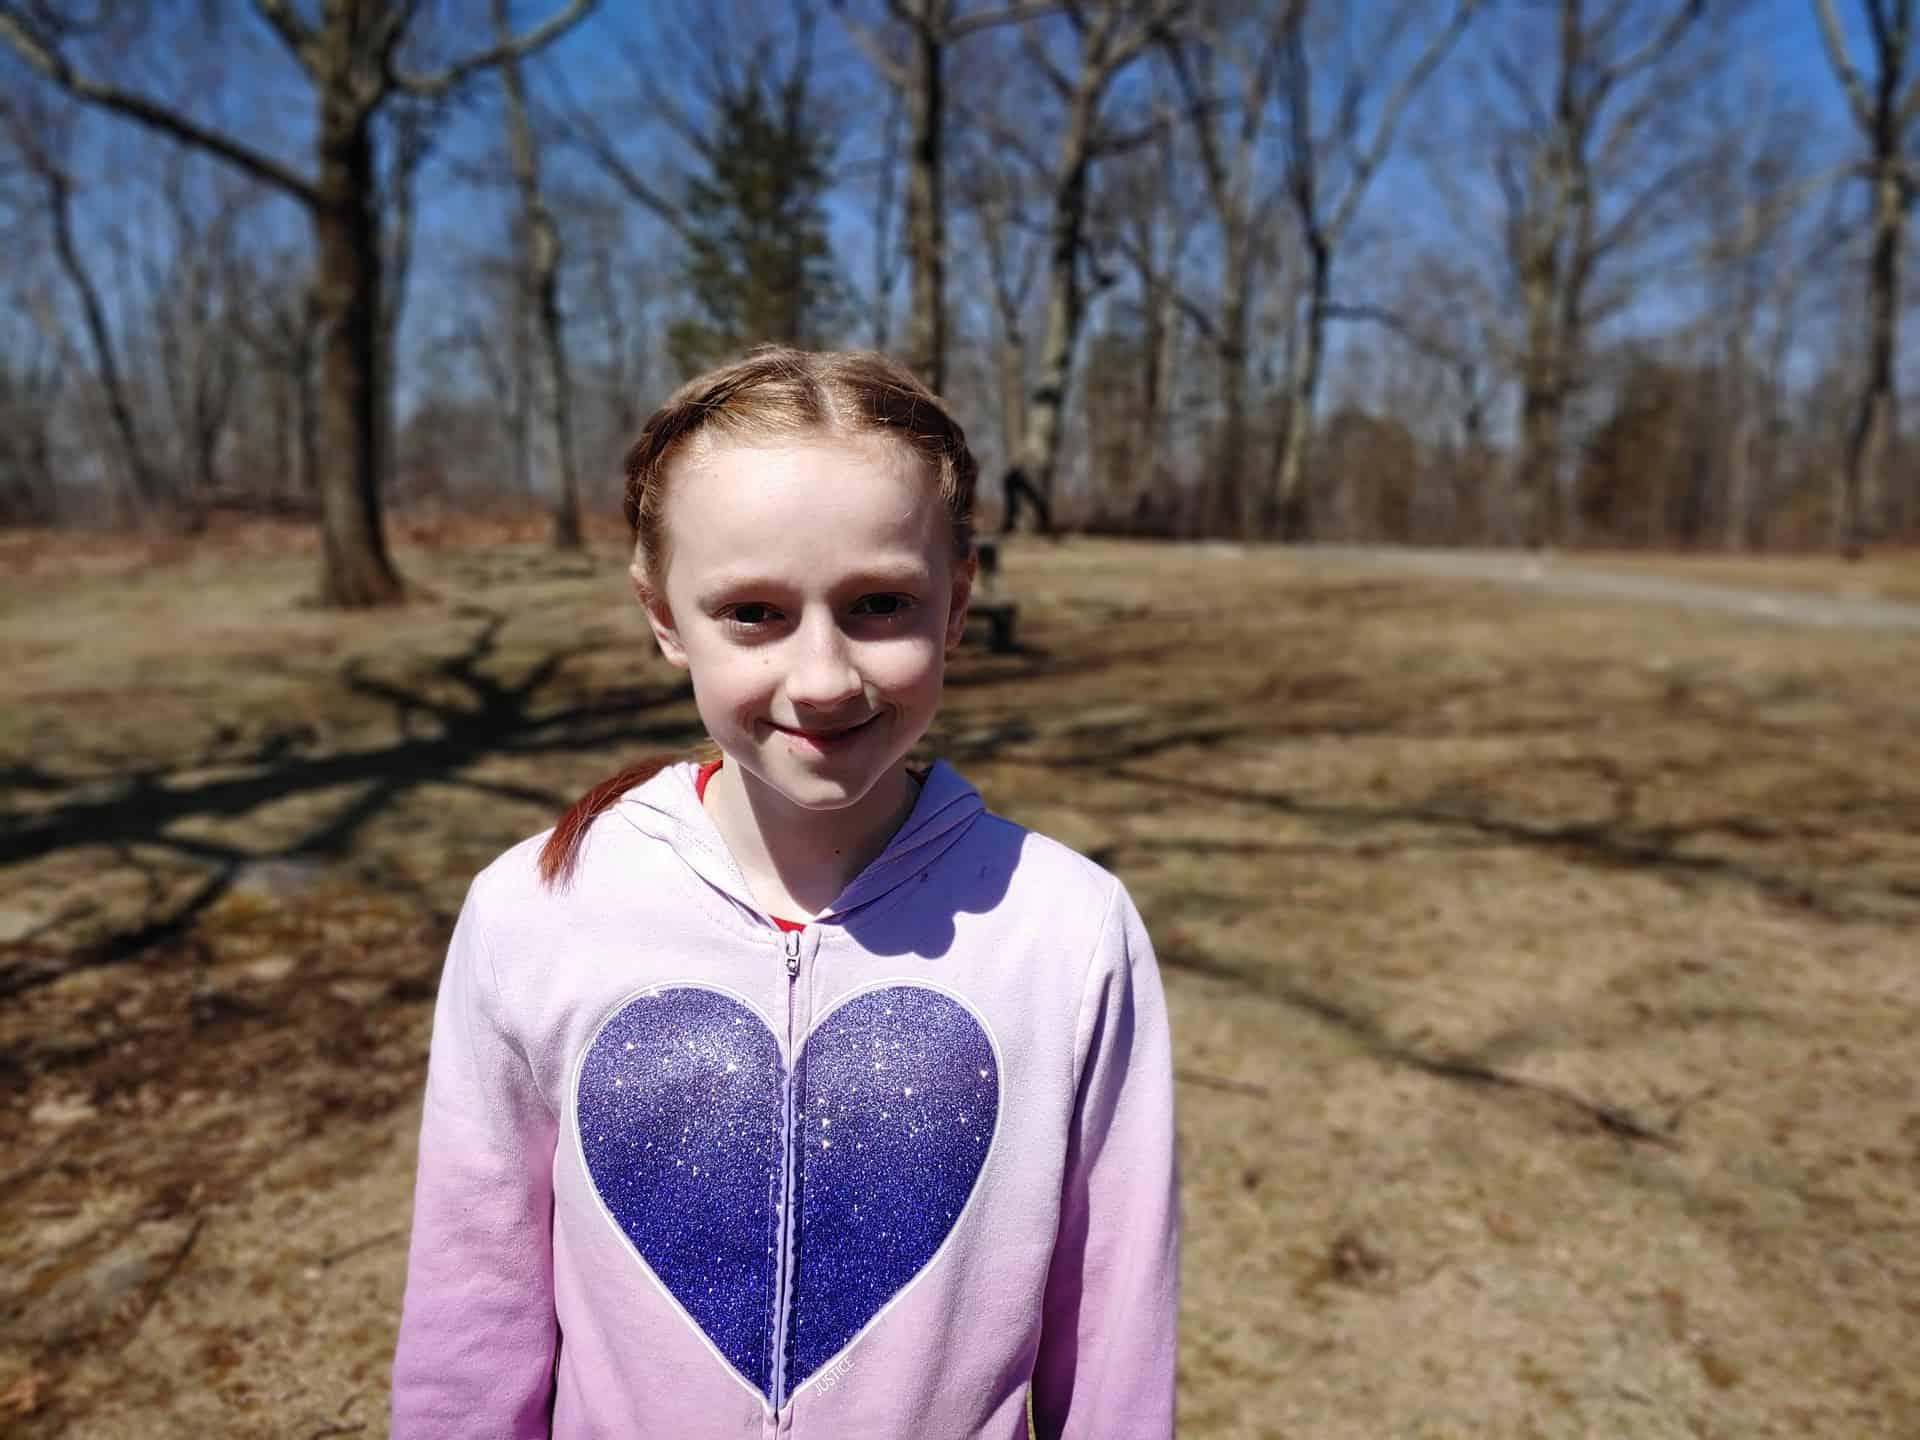 LG G8 ThinQ Review Photo Sample portrait